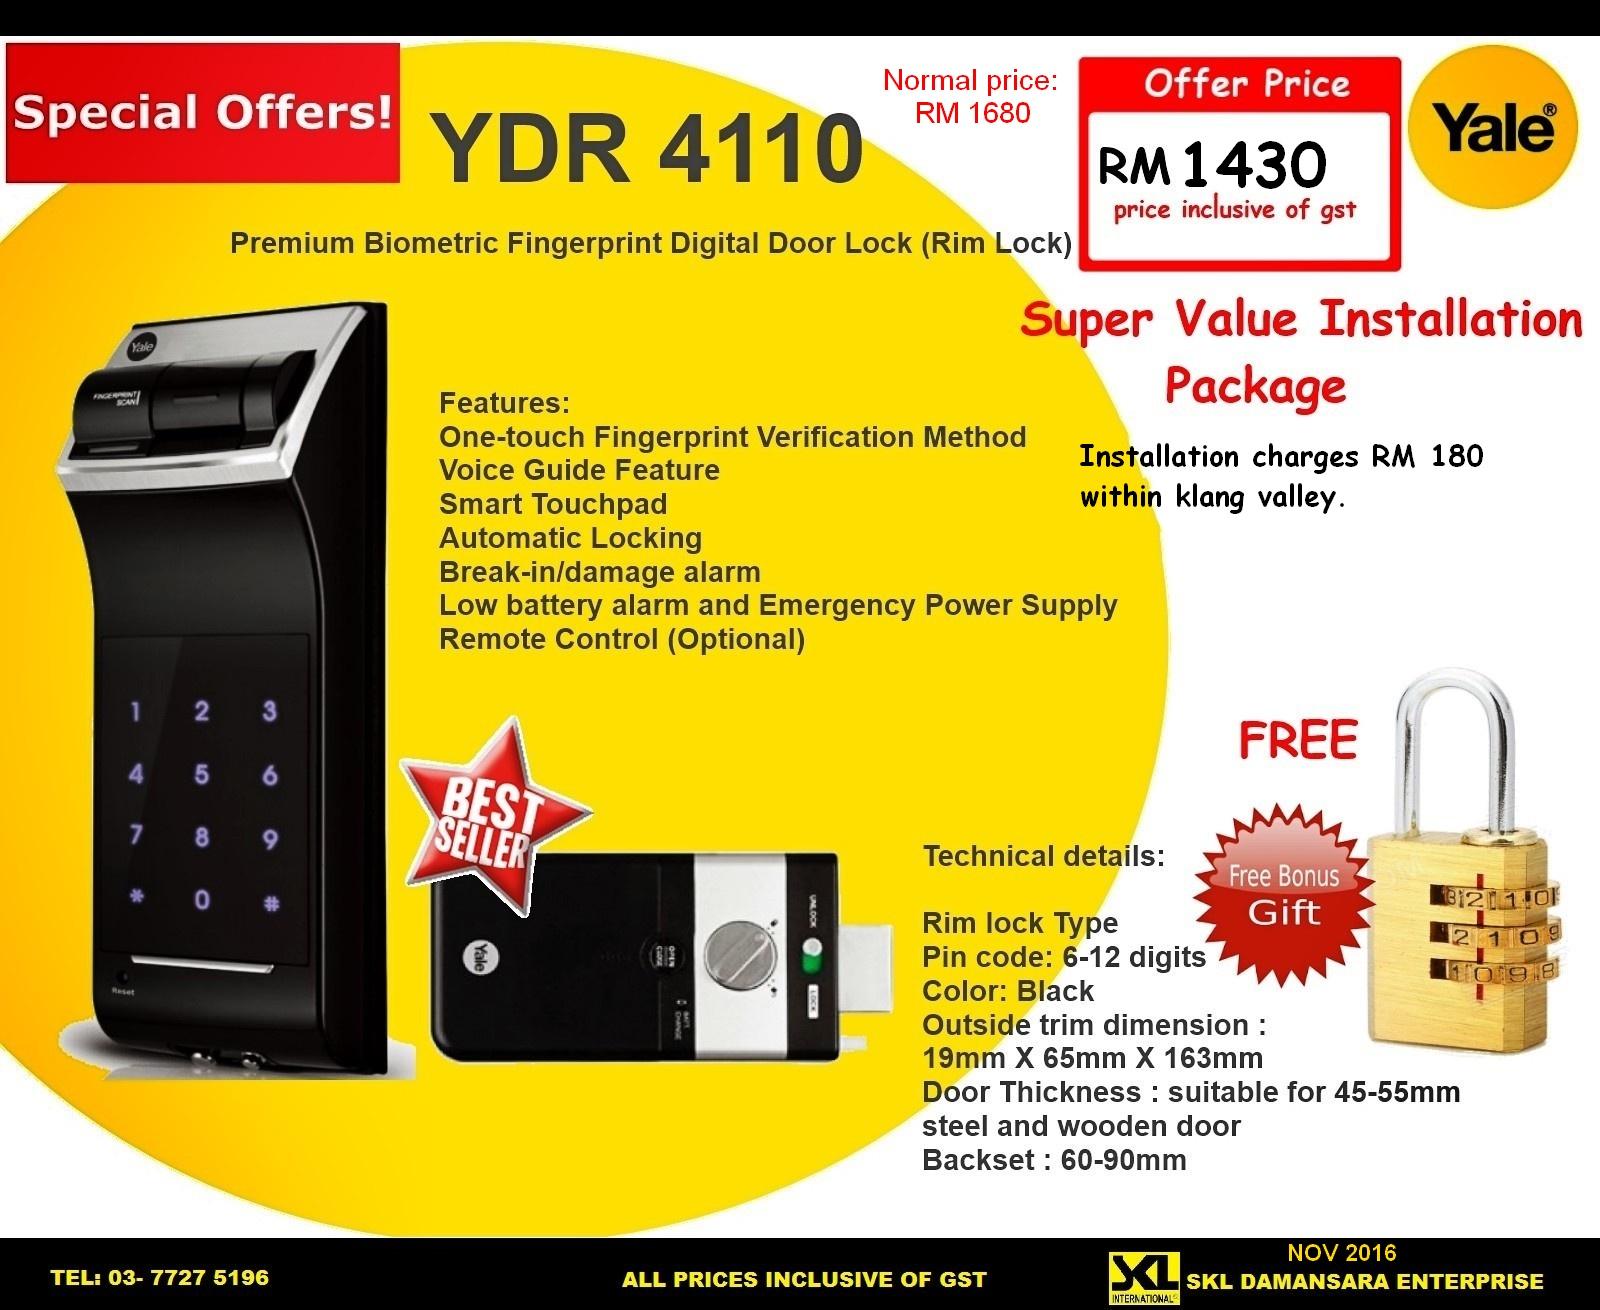 Skl Diy Uptown Yale Ydr 4110 Digital Door Lock Promotino